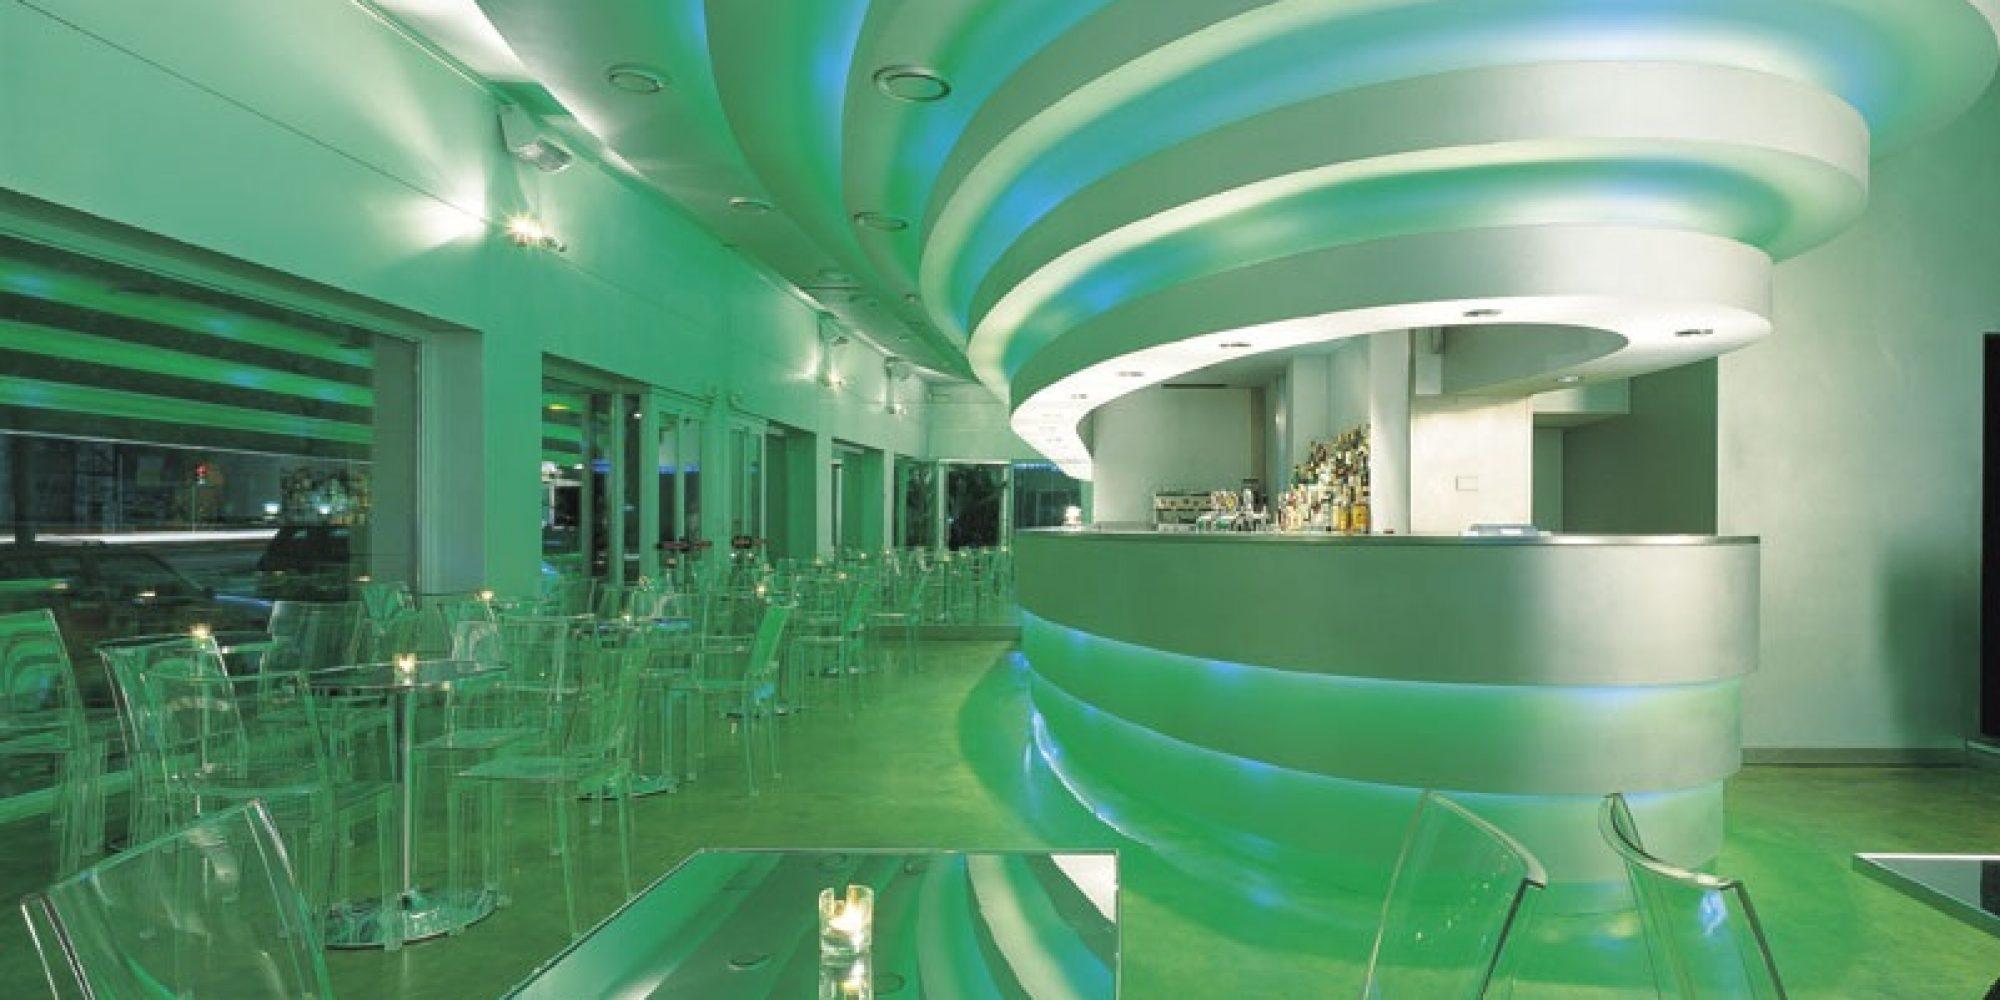 01_Shu_restaurant_cafè_Milano_1999